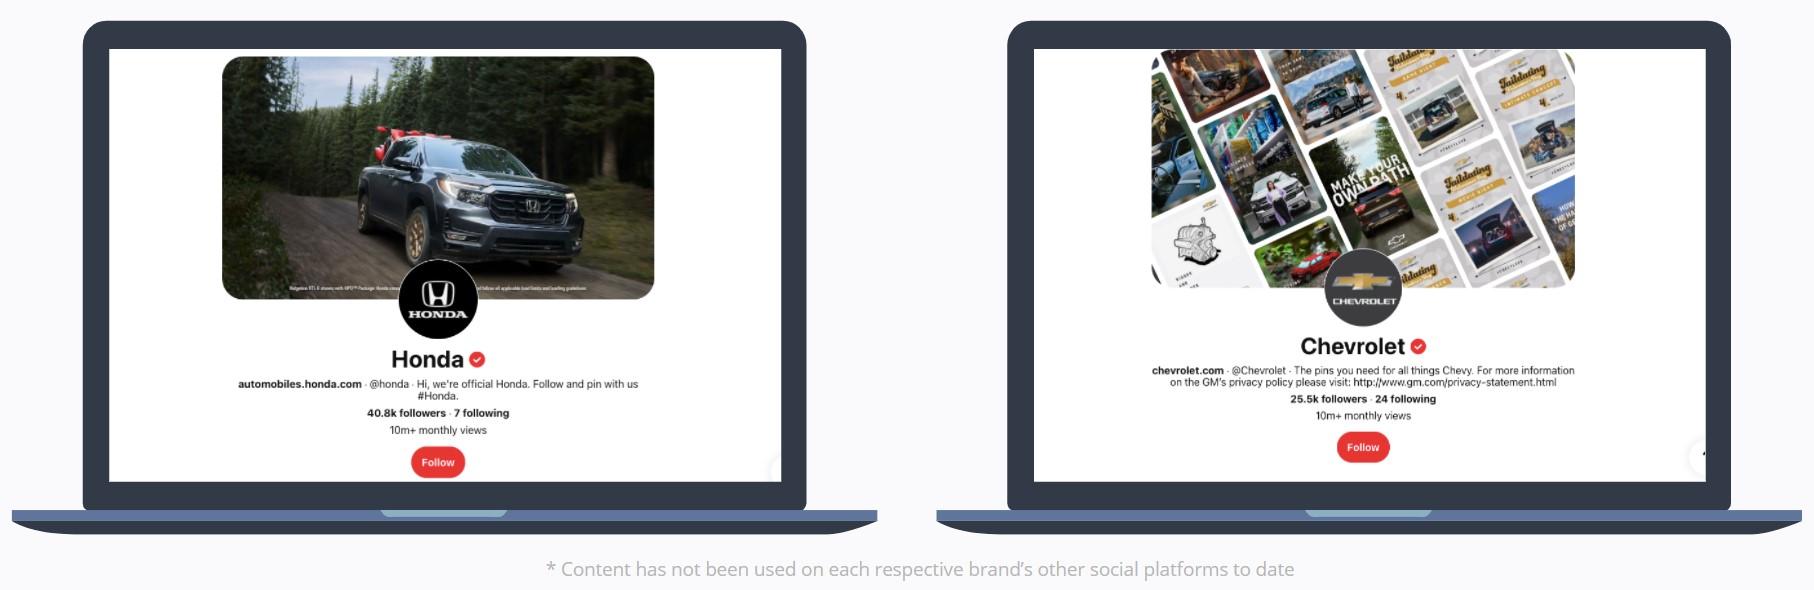 Pinterest - Honda and Chevrolet Story Pins